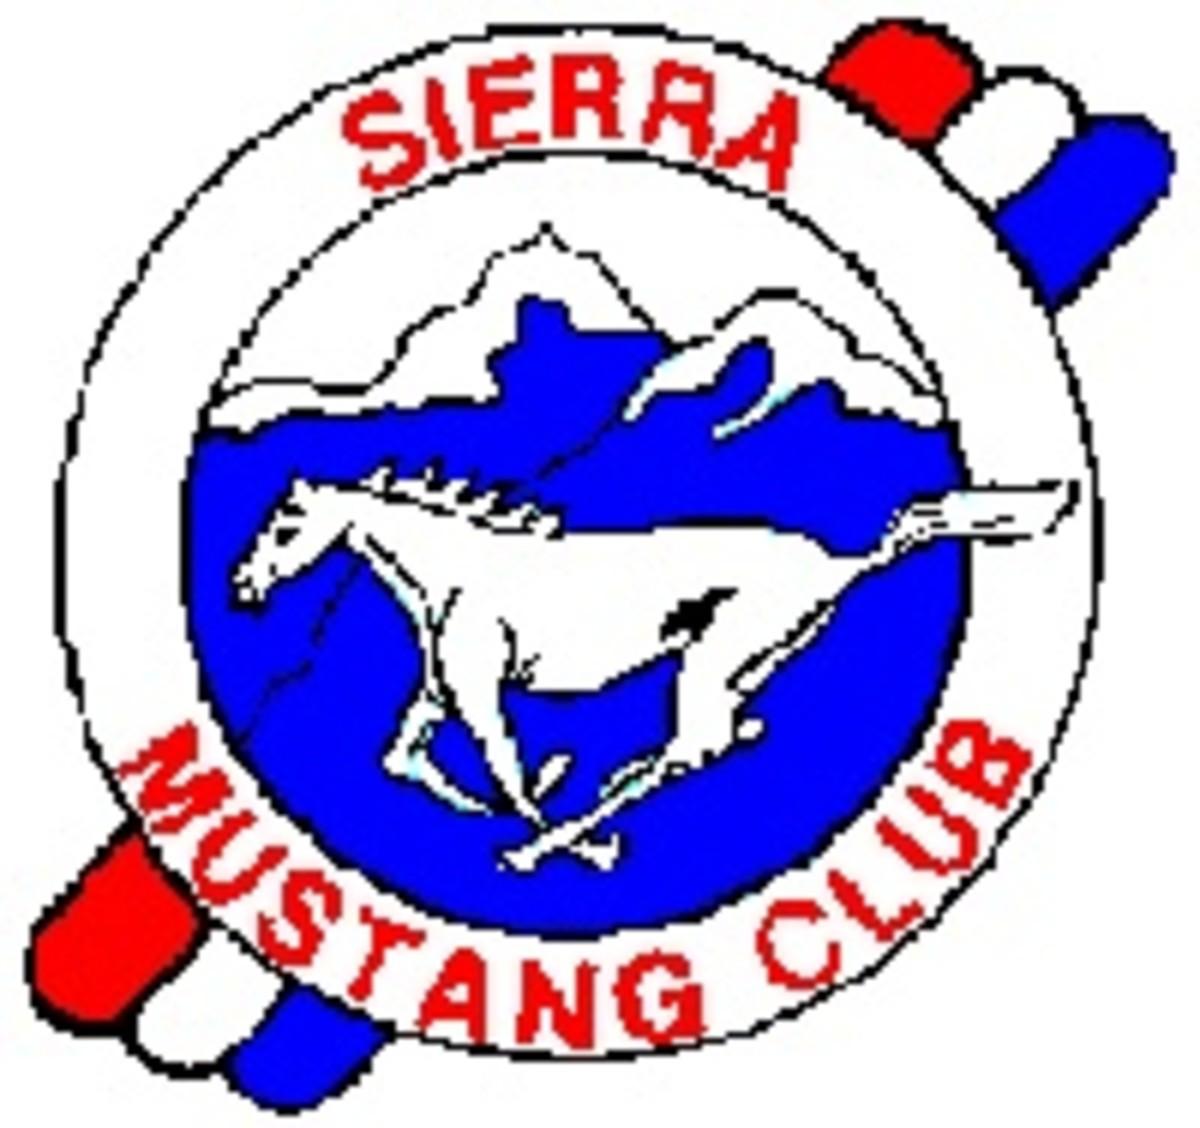 sierramustangclub